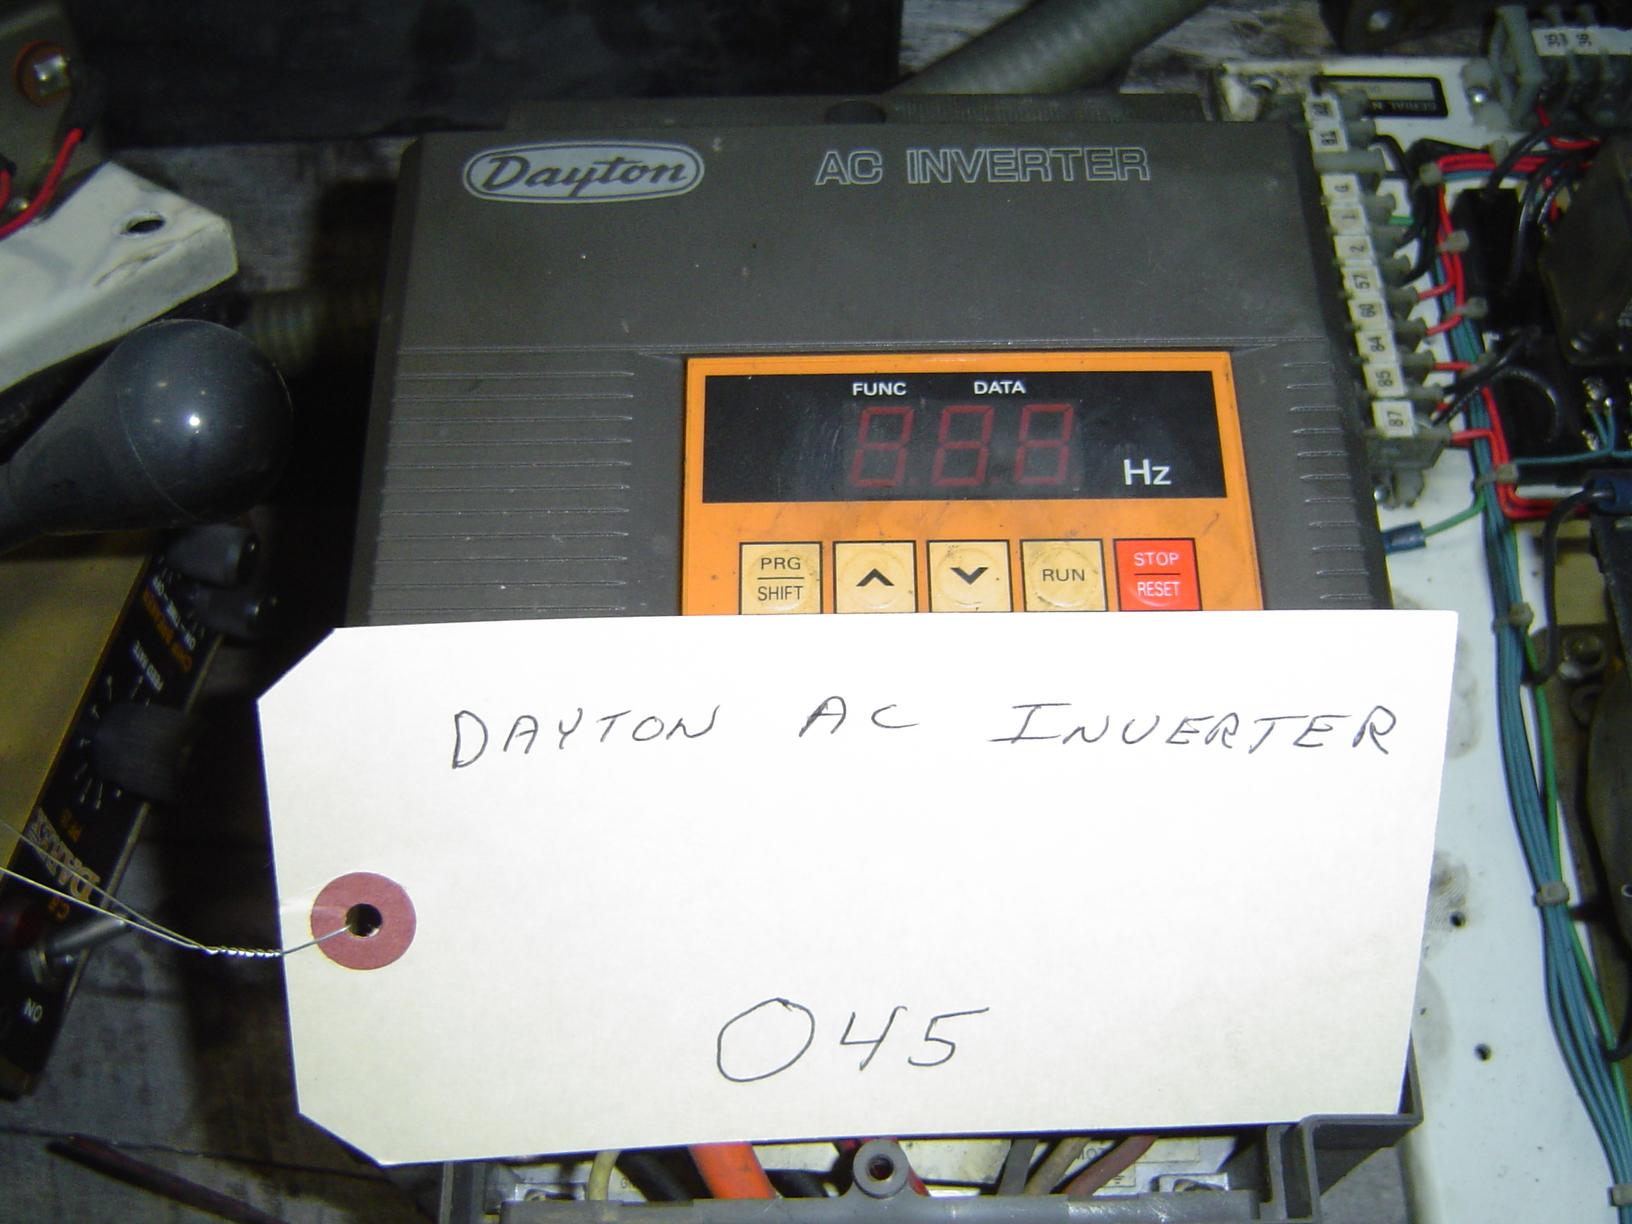 DAYTON AC INVERTER